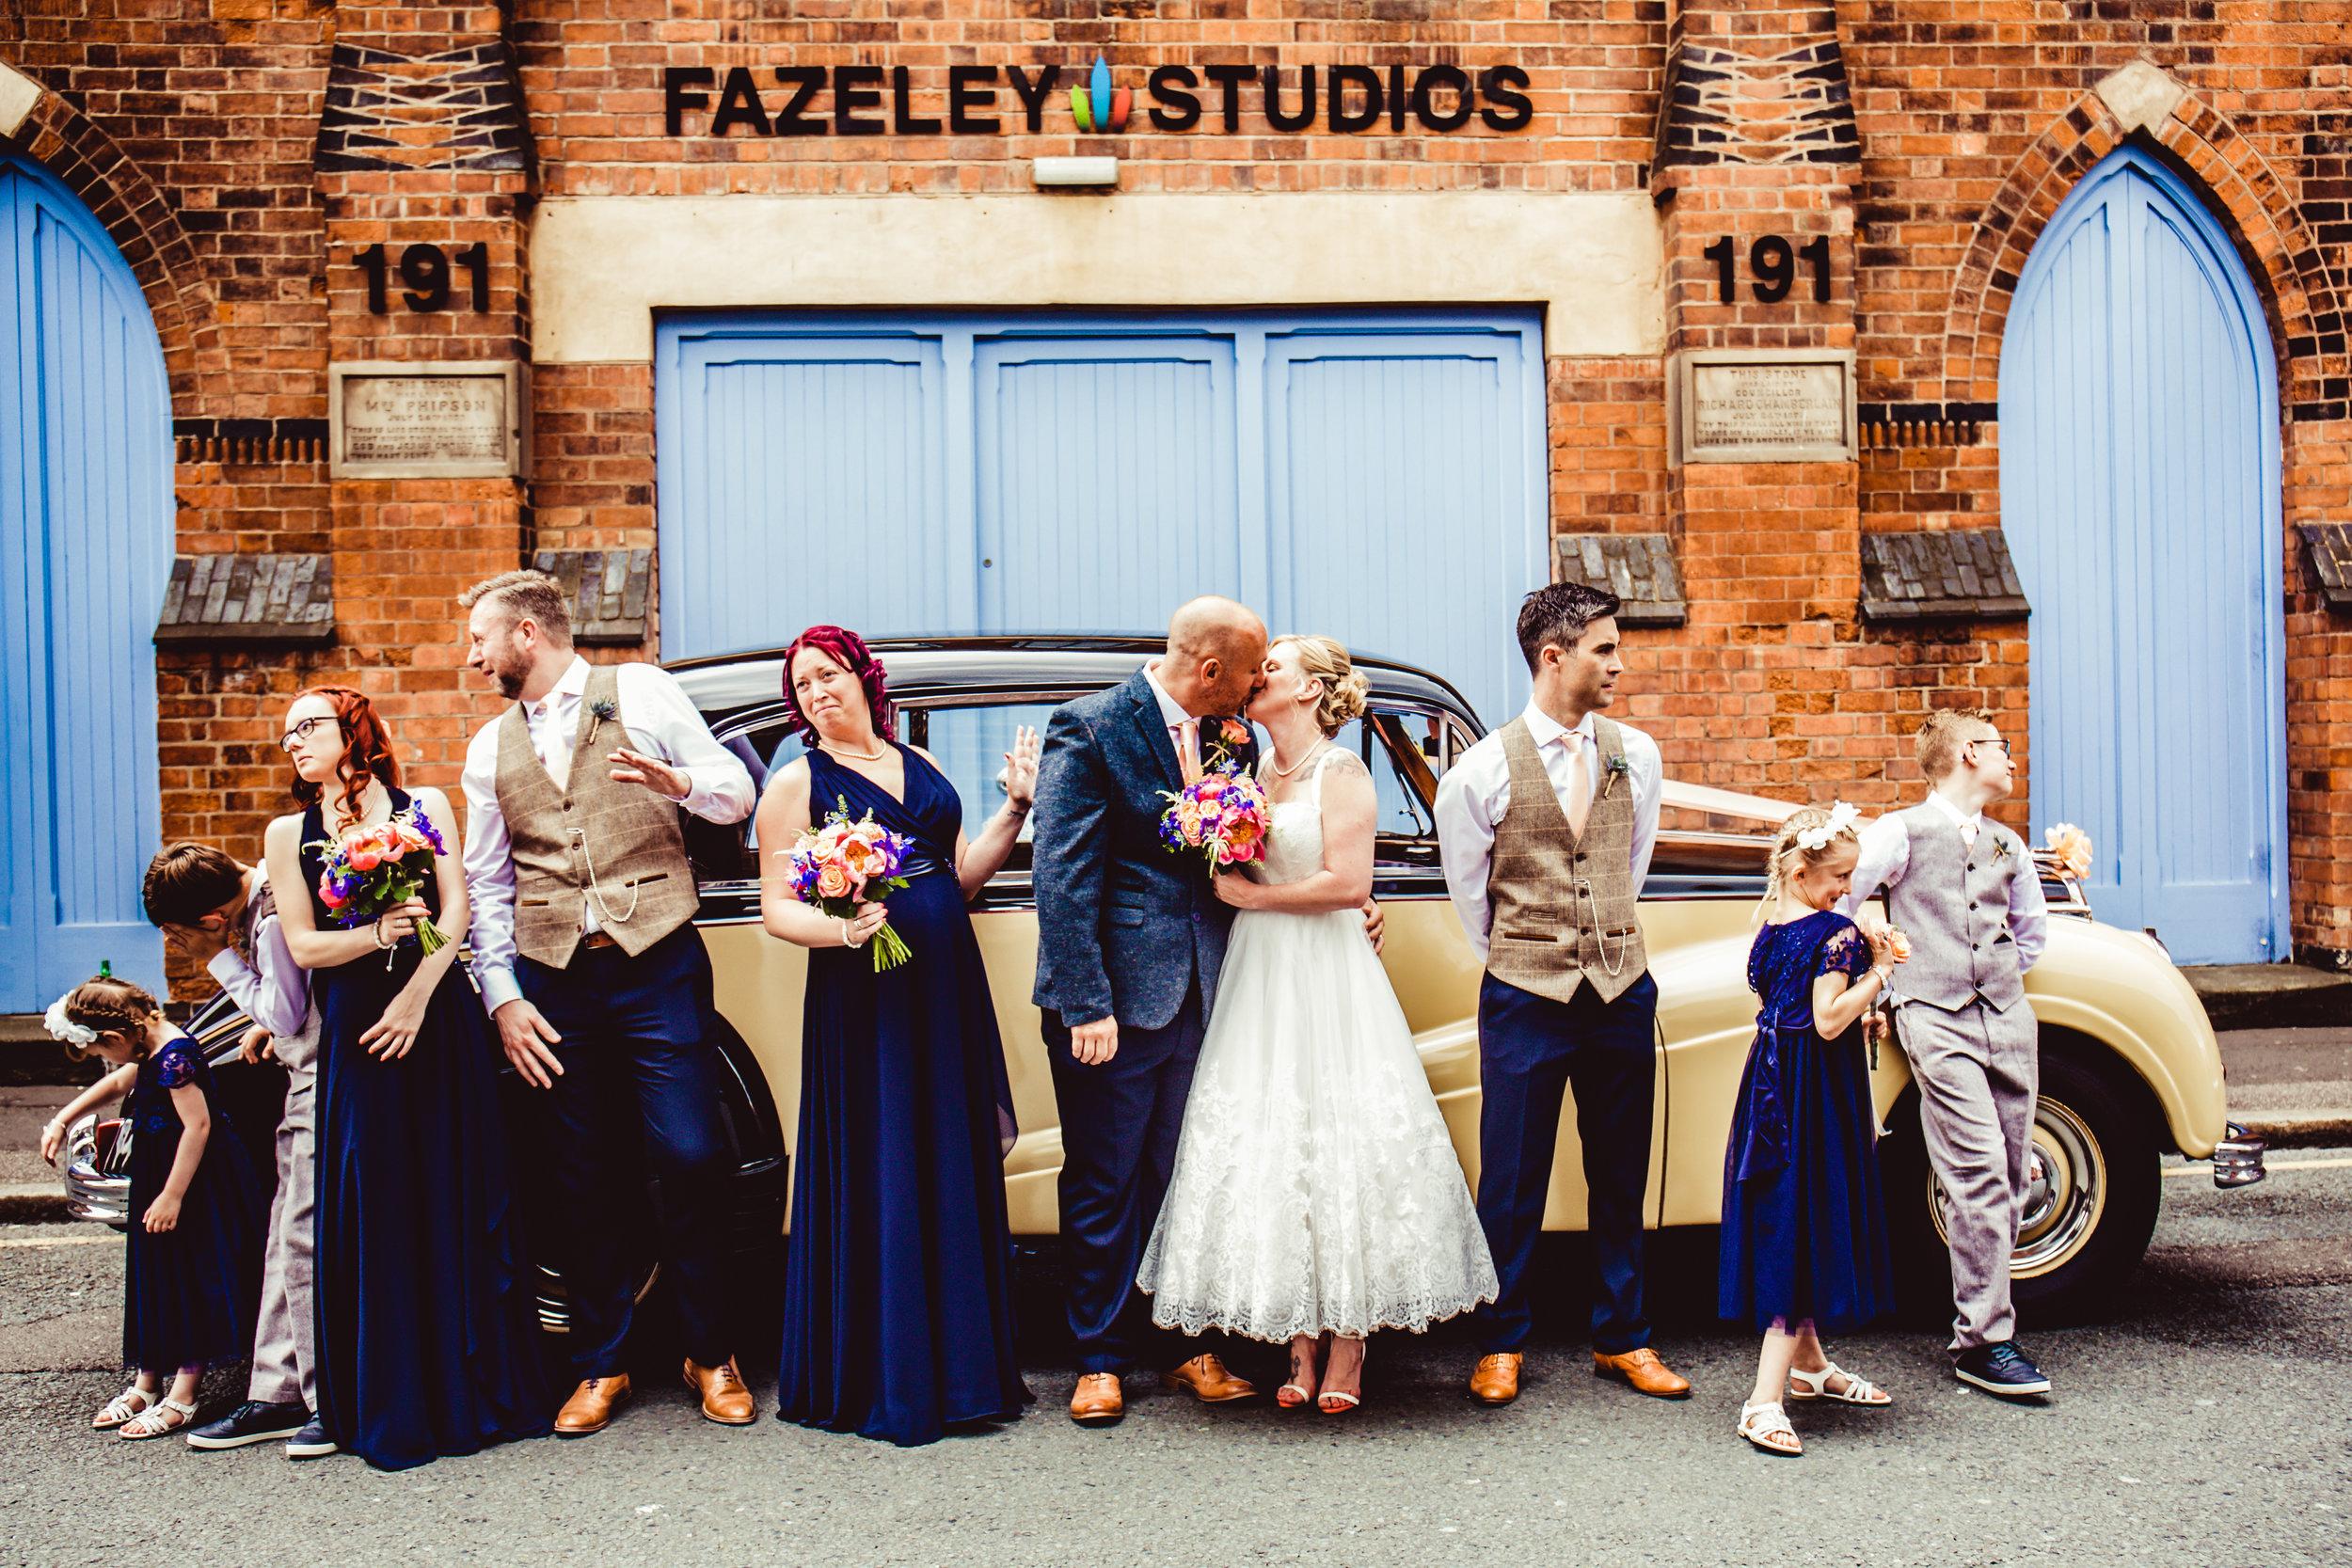 Fazeley Studios Wedding